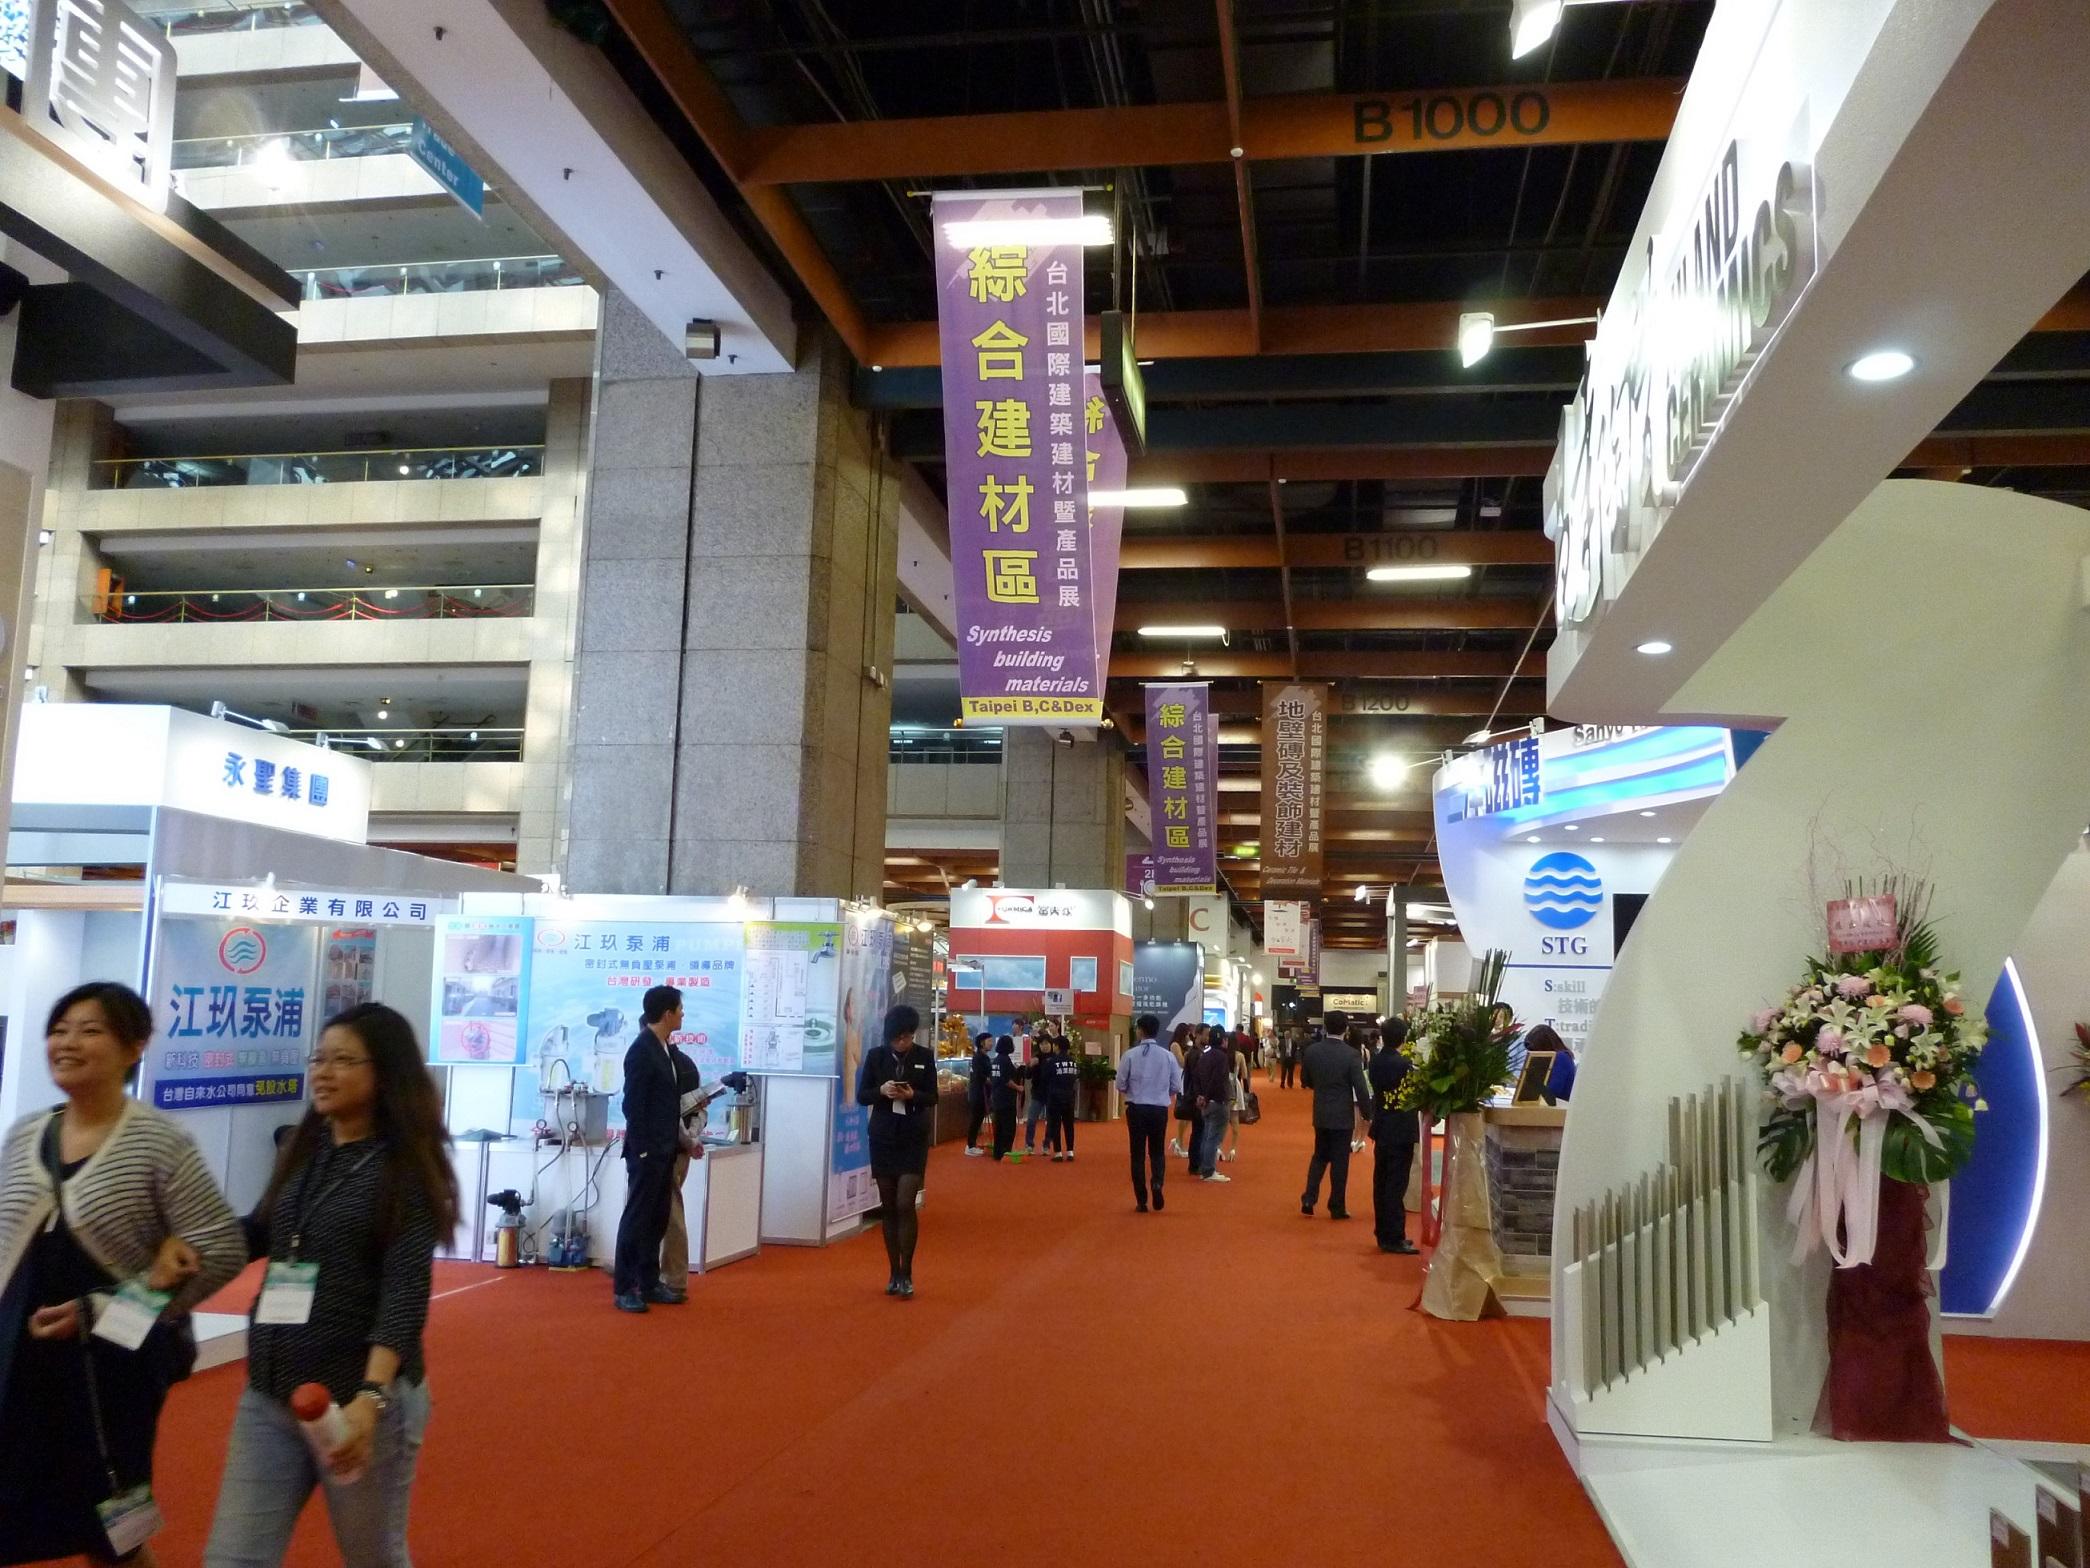 Taipei Building Show 2015 jumps on eco-friendly bandwagon